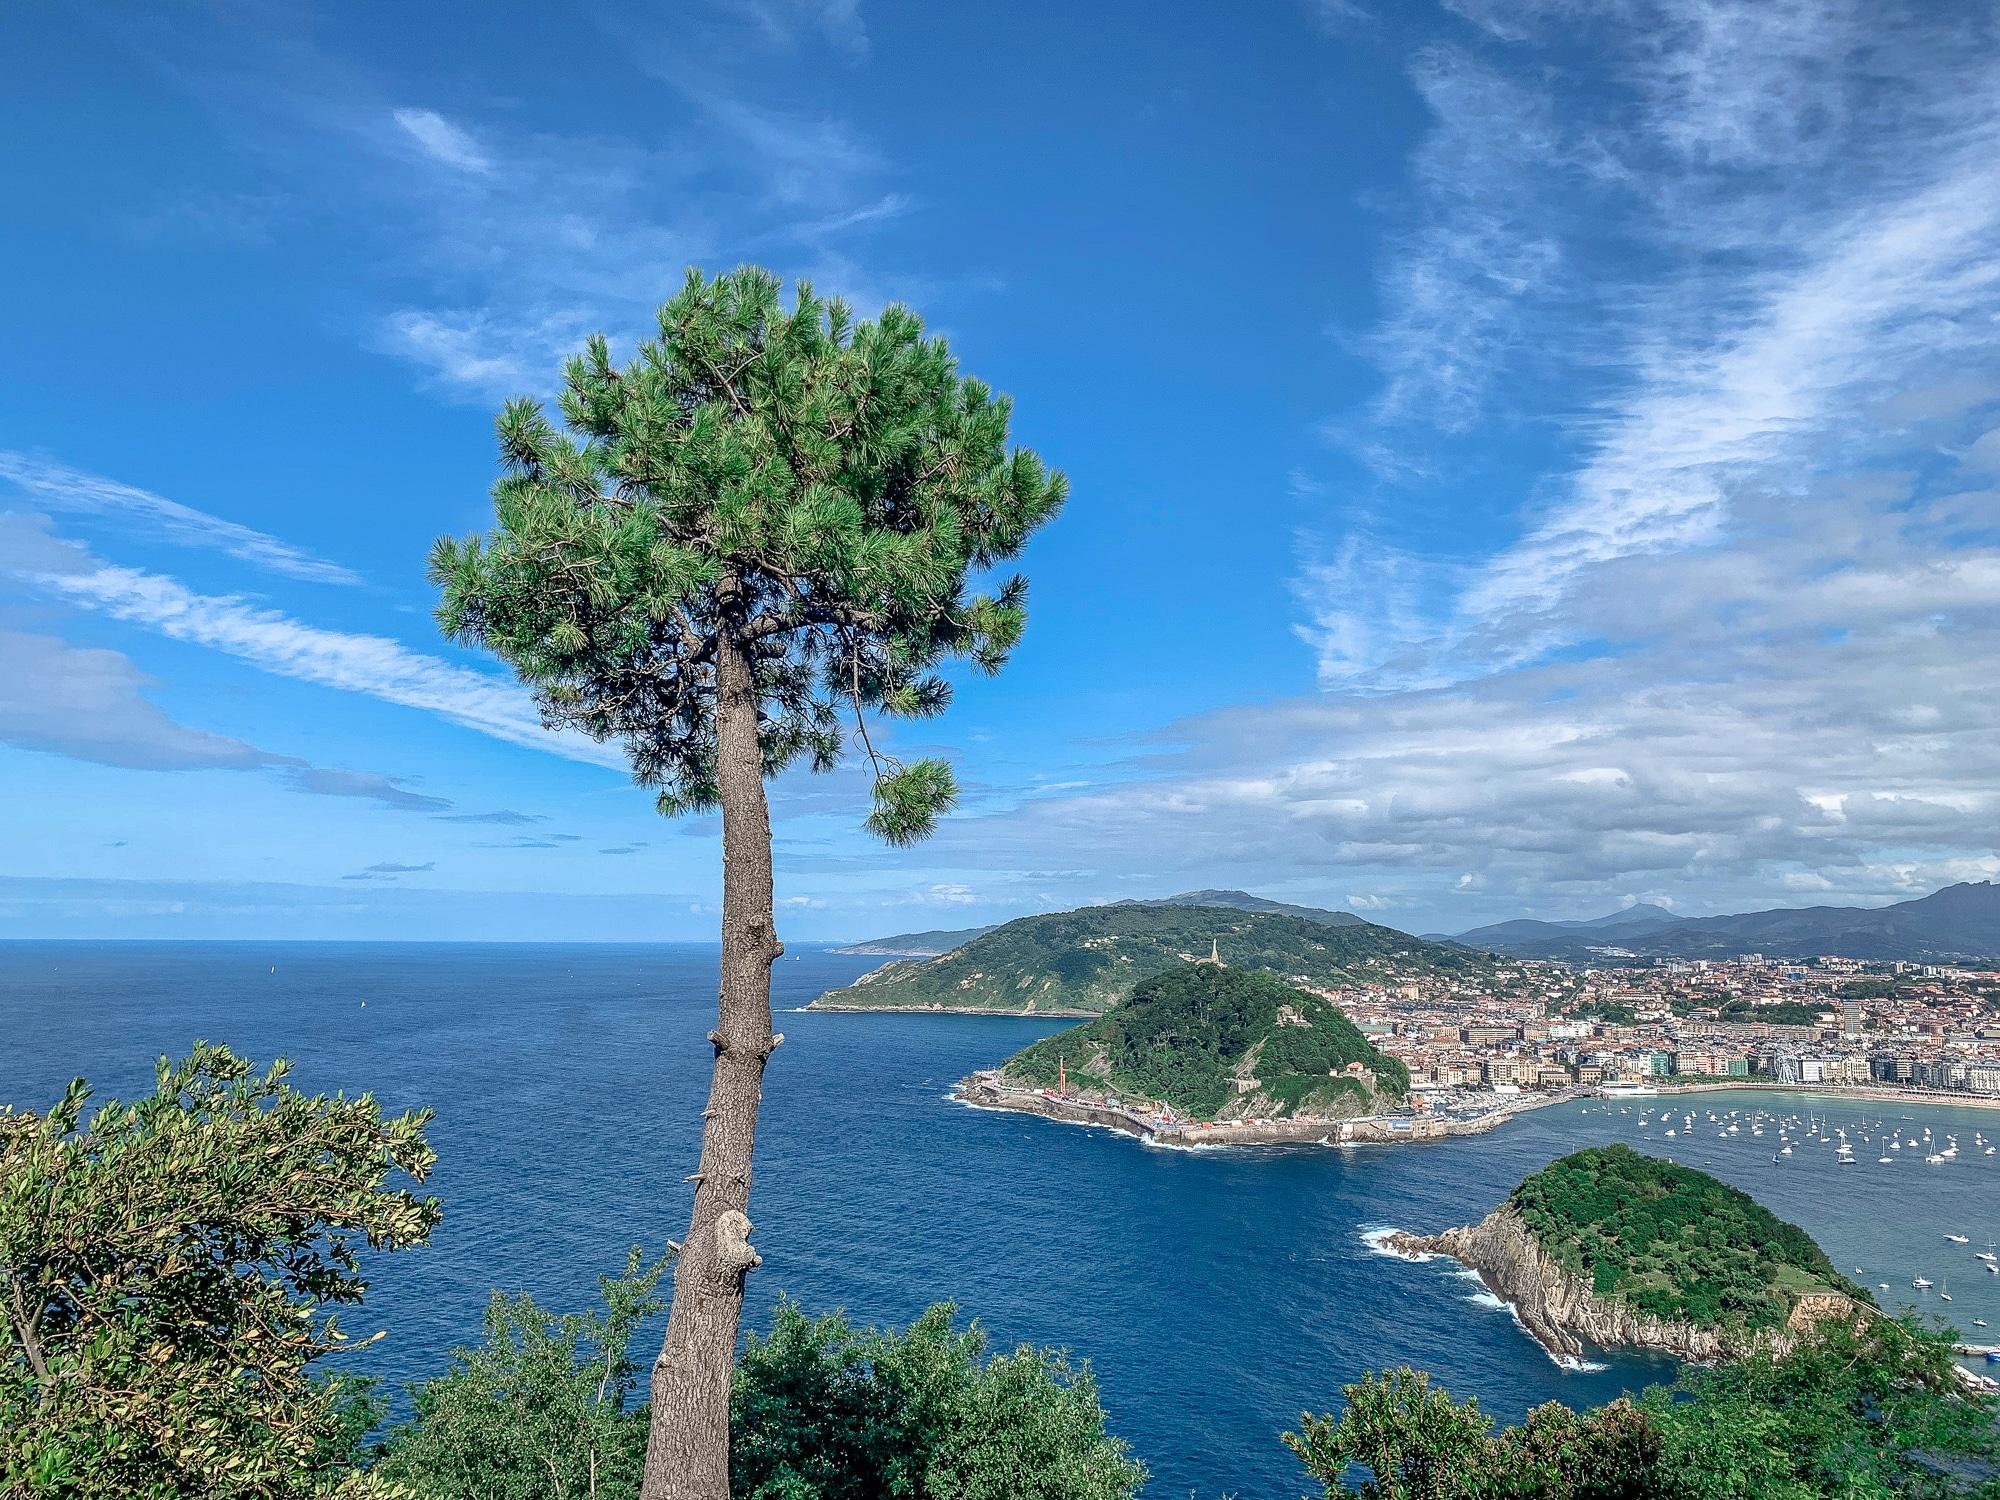 Donostia - San Sebastian - Stadtstrand - Ausblick vom Monte Igueldo